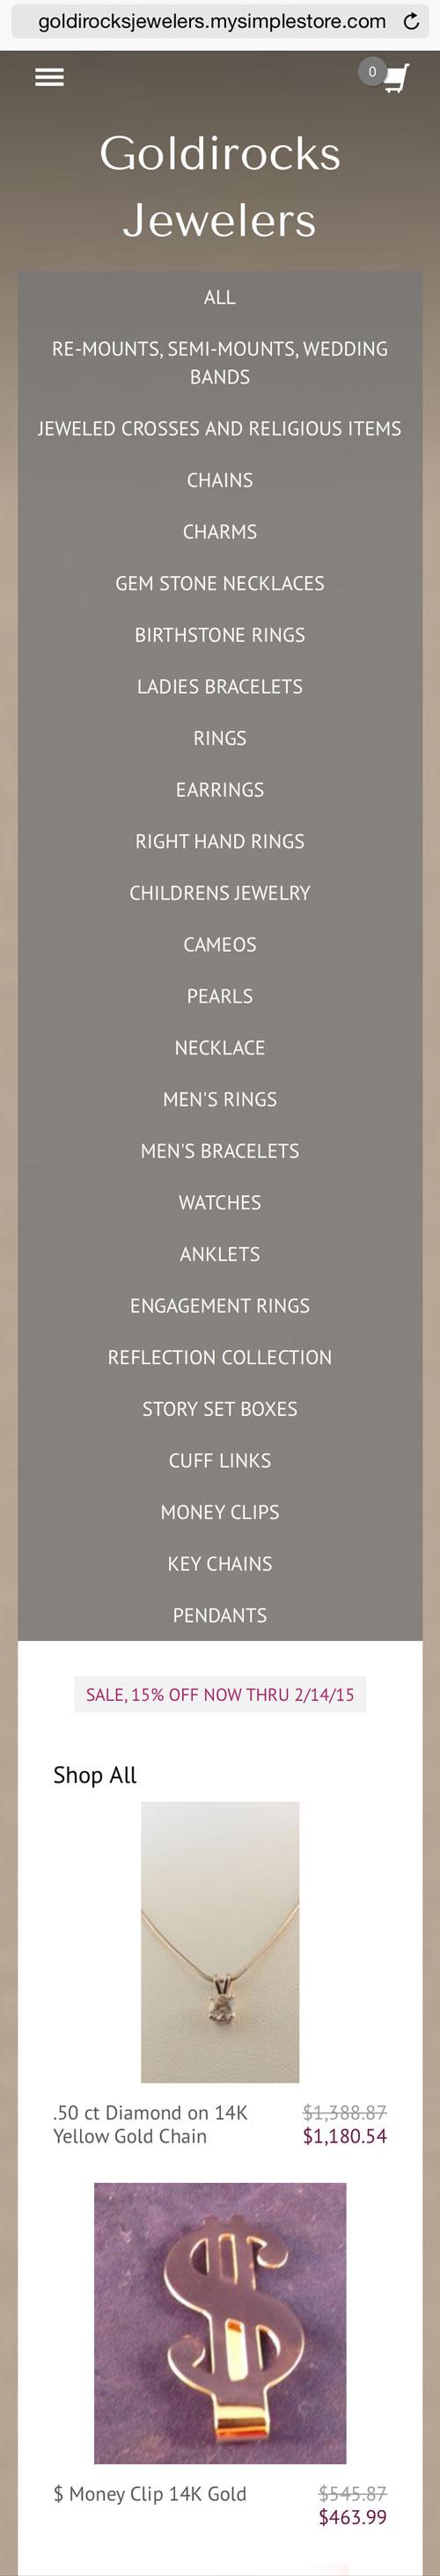 Goldirocks Jewelers Website Review 1250-shop-mobile-85